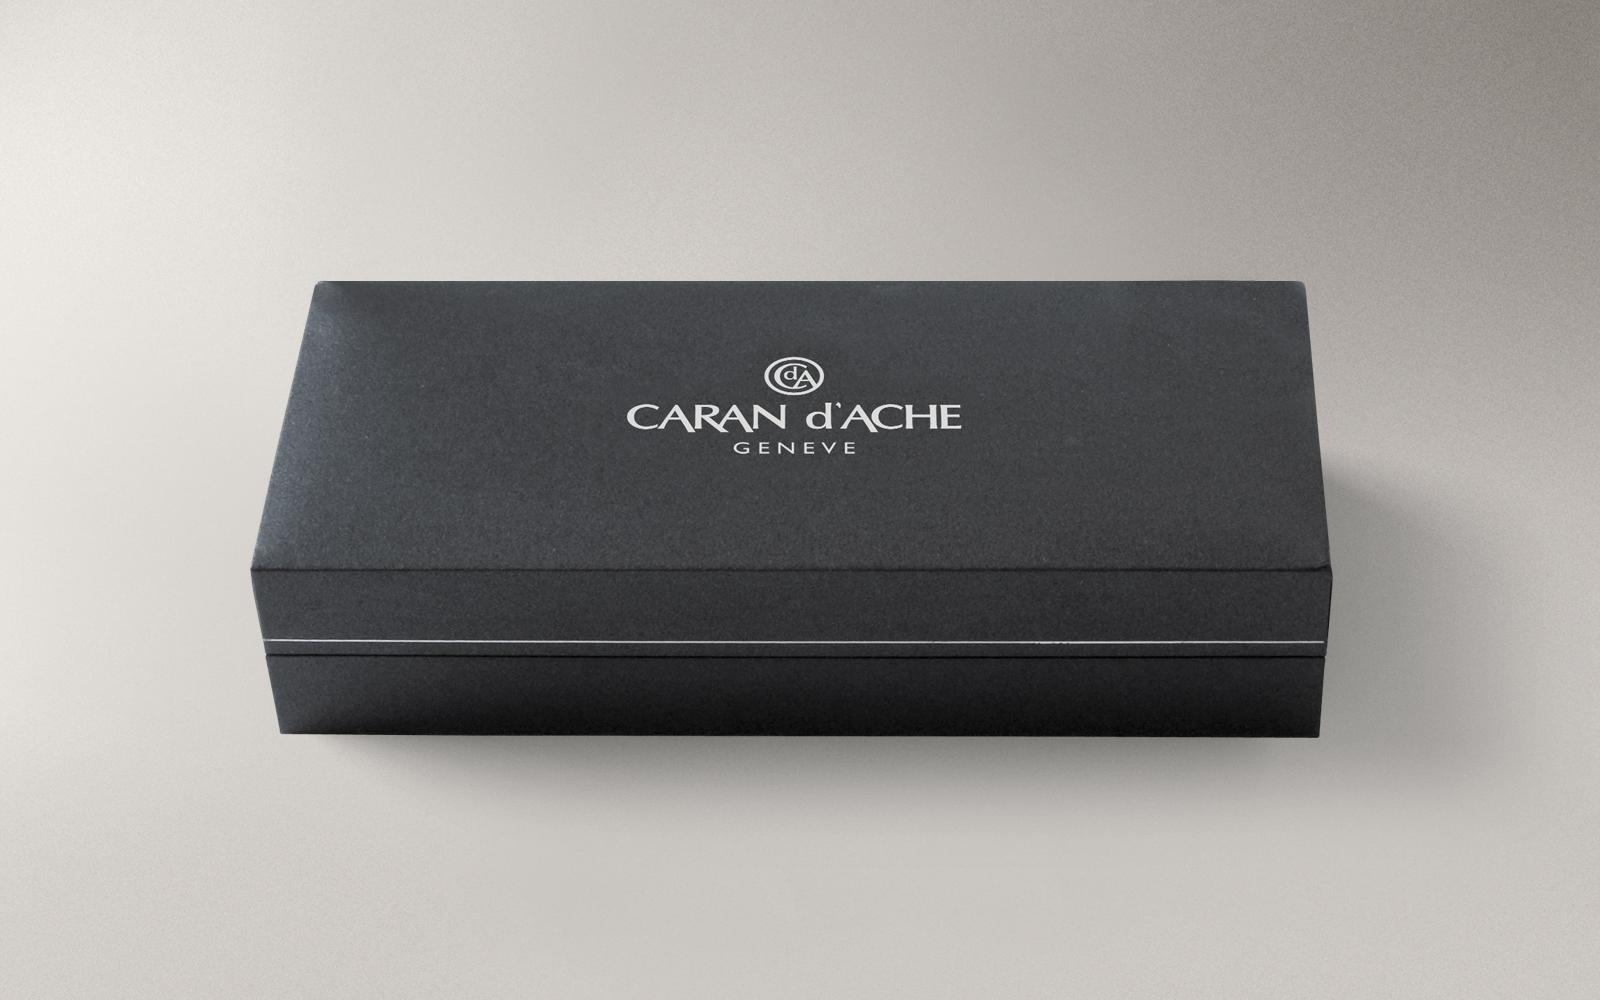 Carandache Leman - Caviar SP, ручка-роллер, F